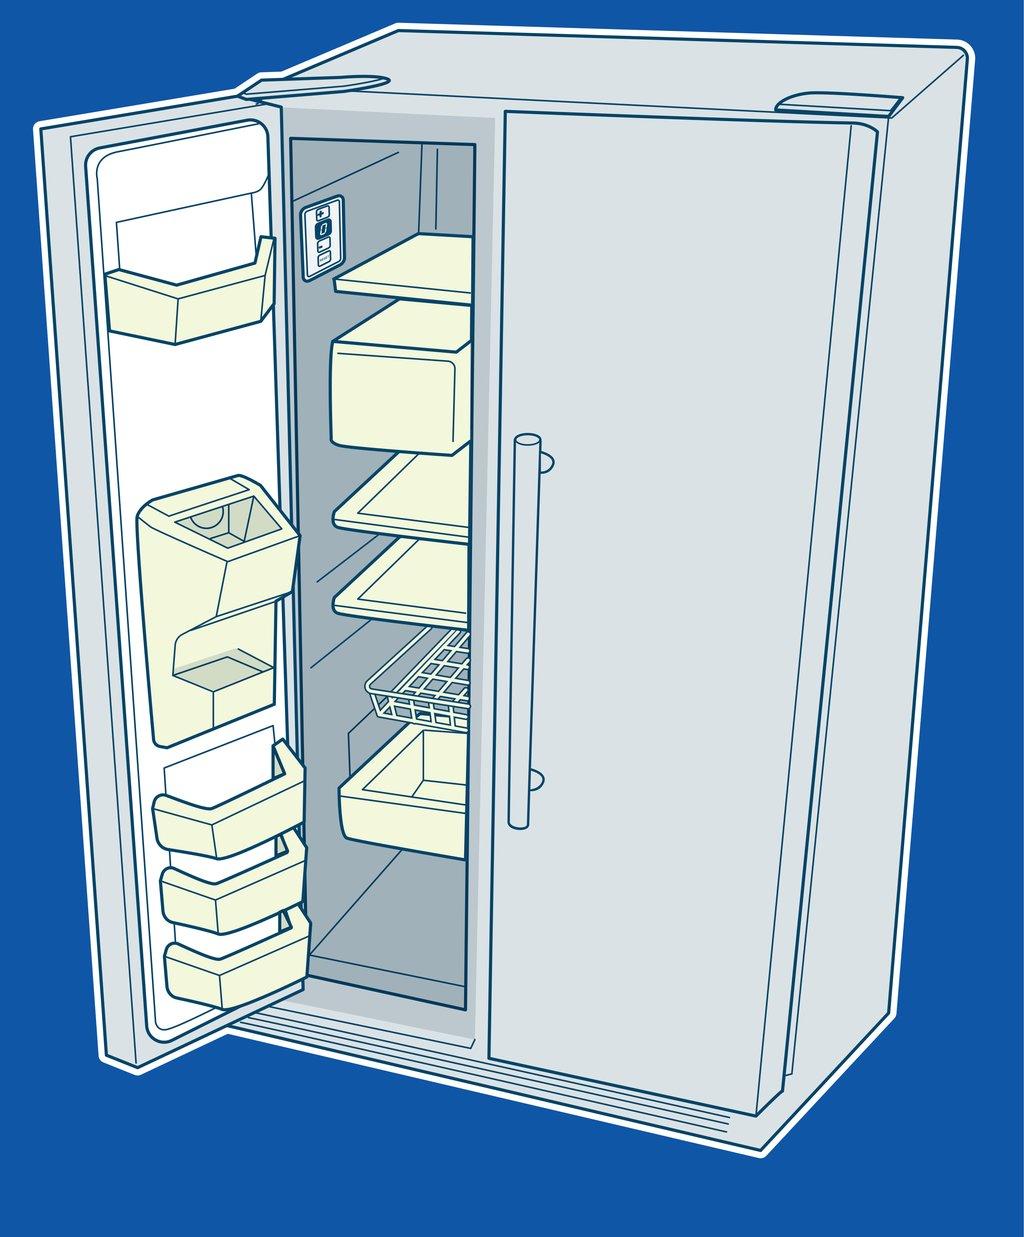 hight resolution of mini fridge defrost timer wiring diagram